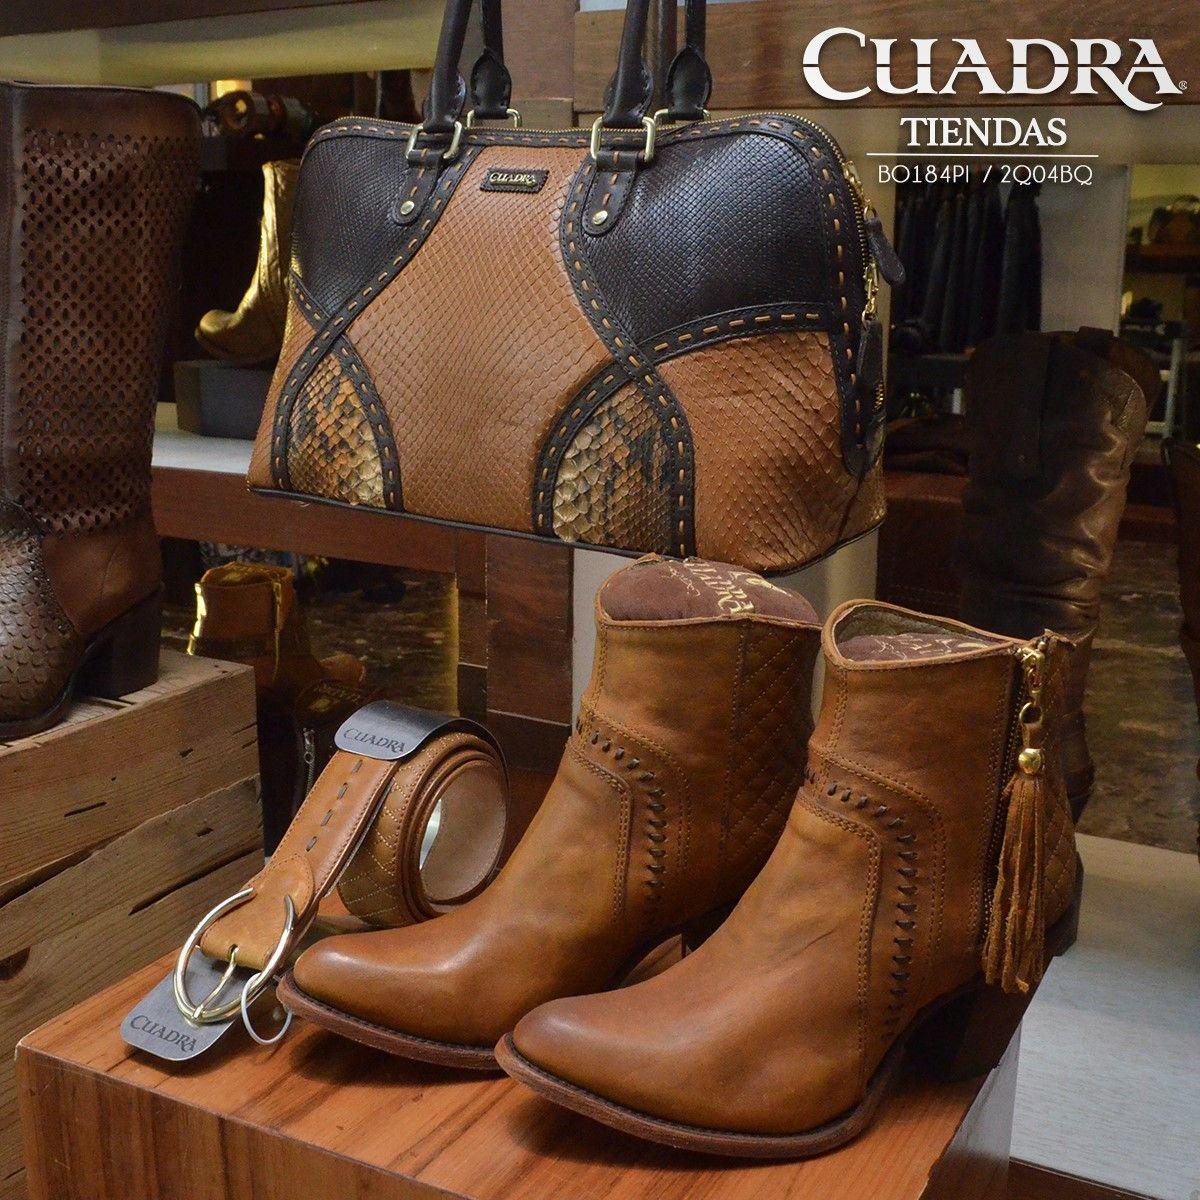 04a2e5d63d702 Belleza con calidad artesanal  CUADRA  Shoes  Boots  Botas  Botines  Cinto   Bolsa  FrancoCUADRA  Leather